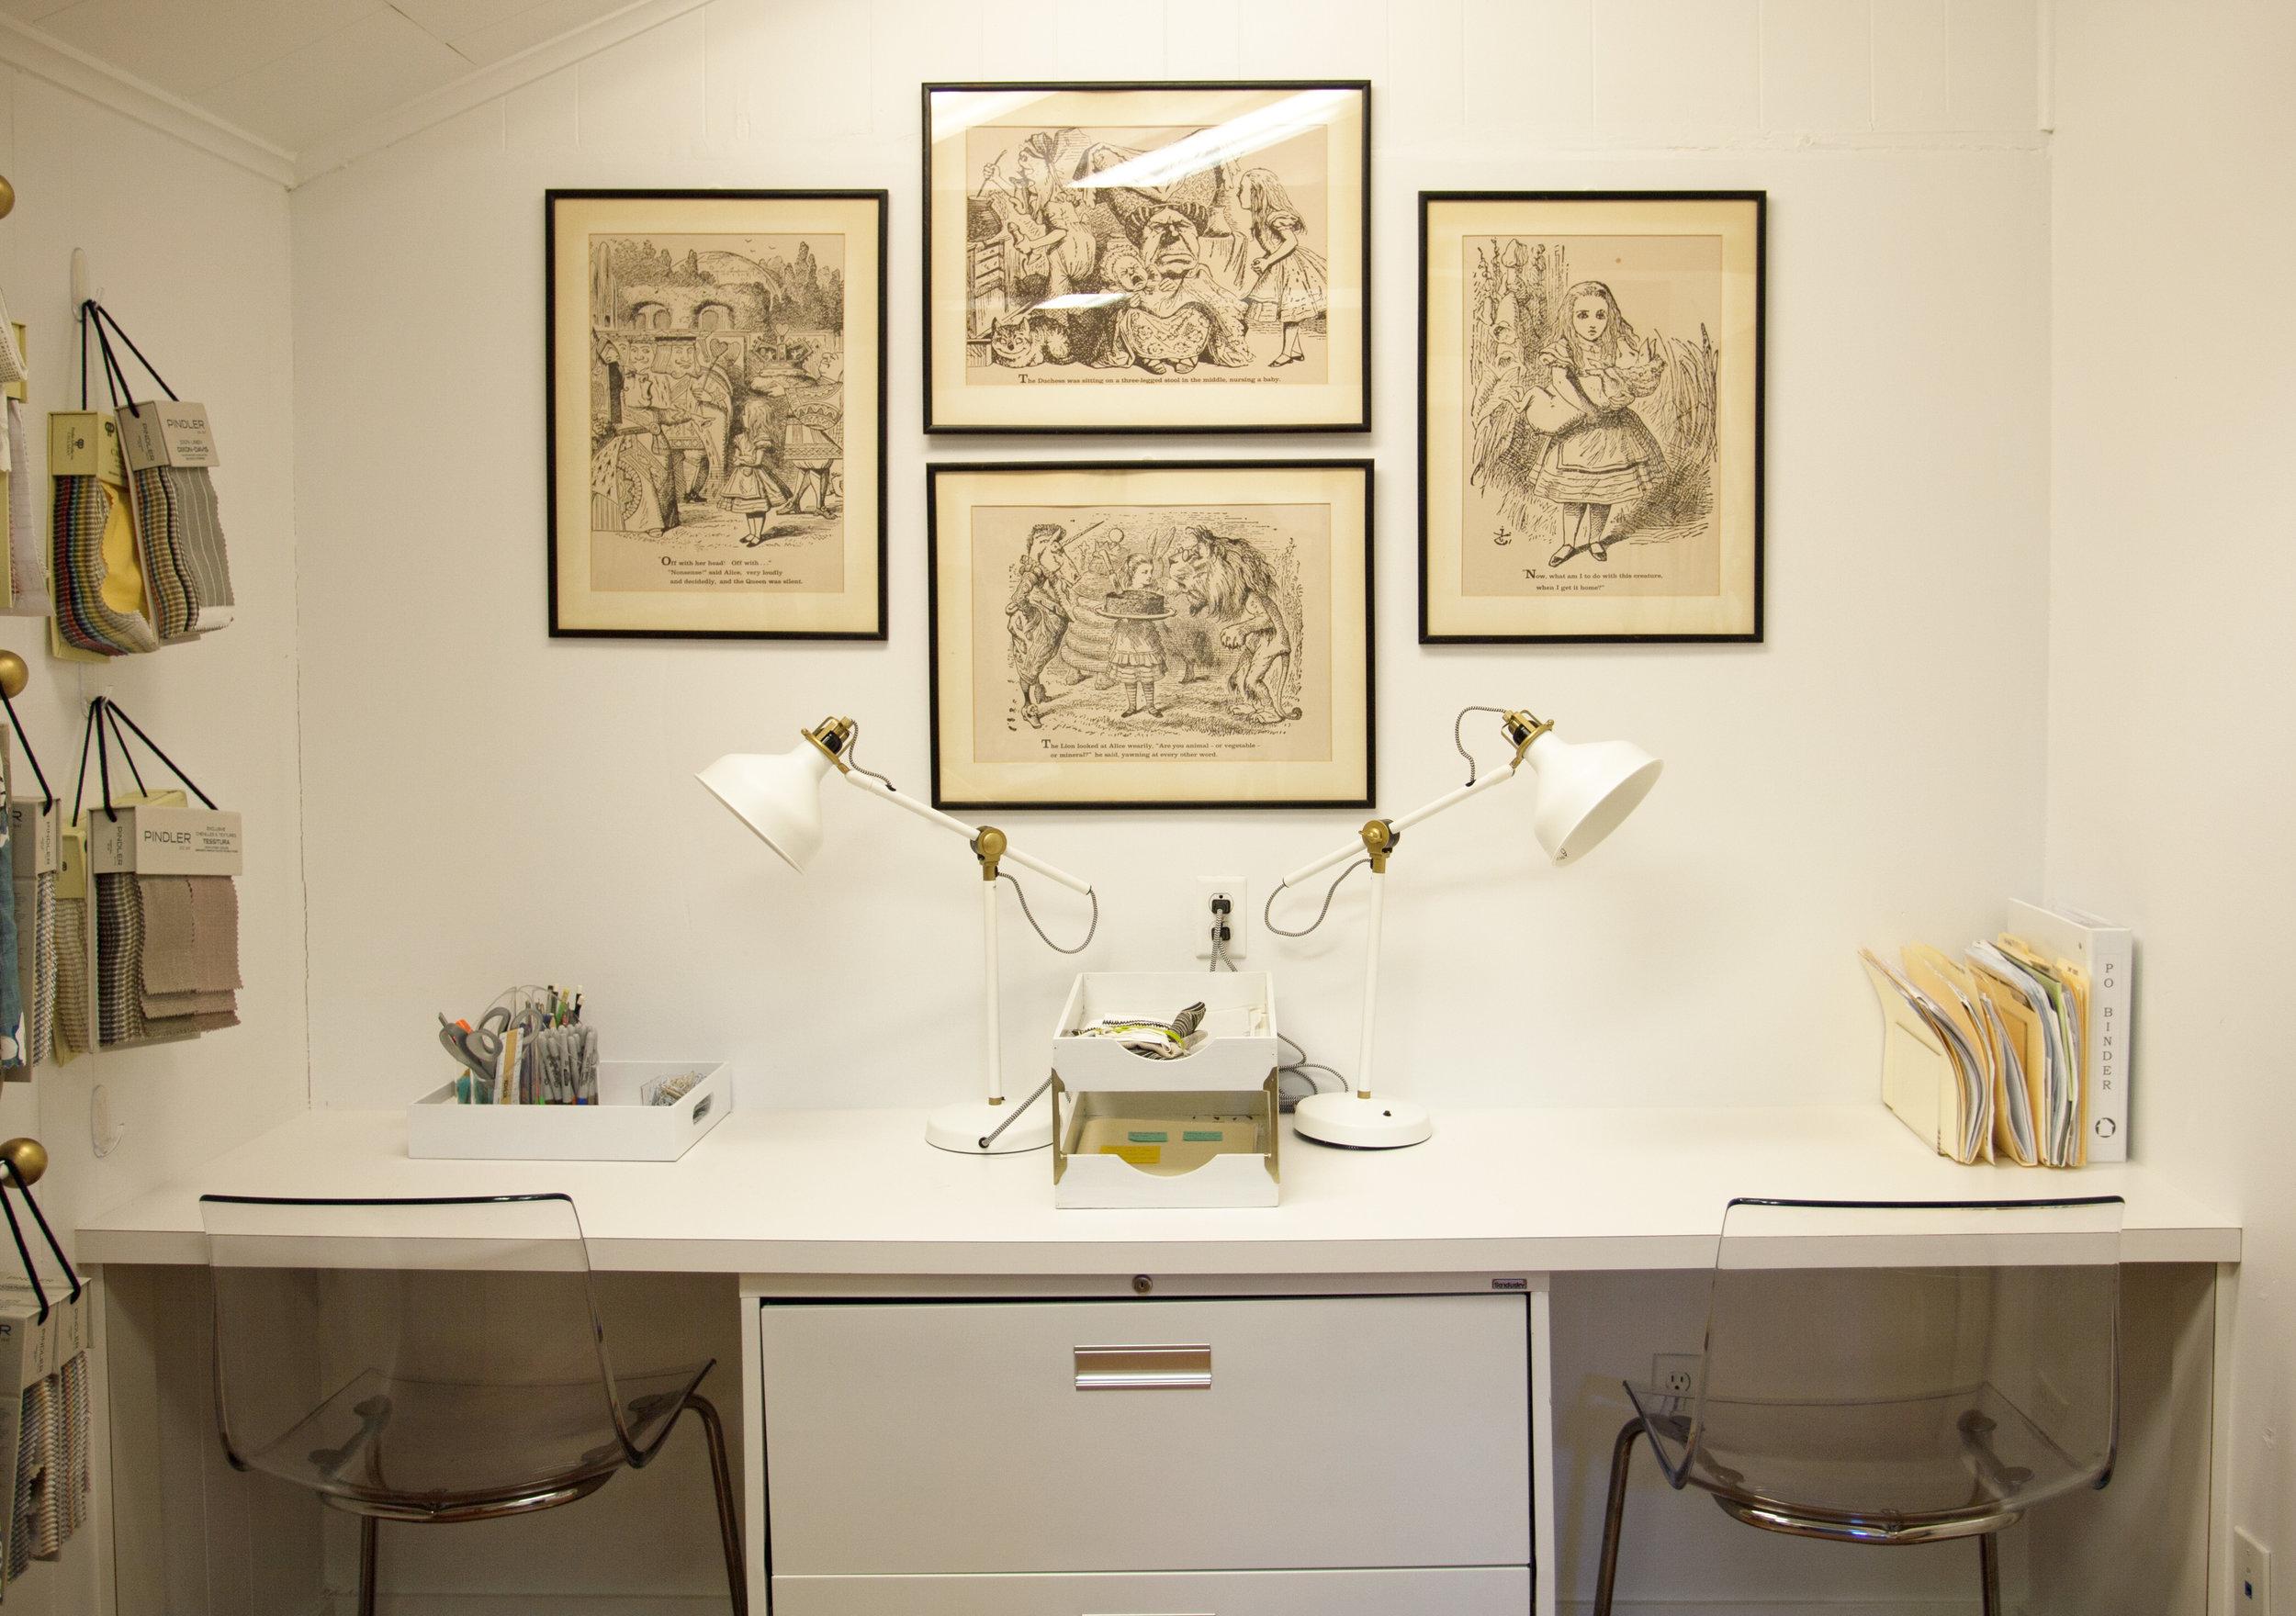 Sample room of interior designer's Montrose Houston design office. Jamie House Design's studio sample room. Vintage Alice in Wonderland prints.